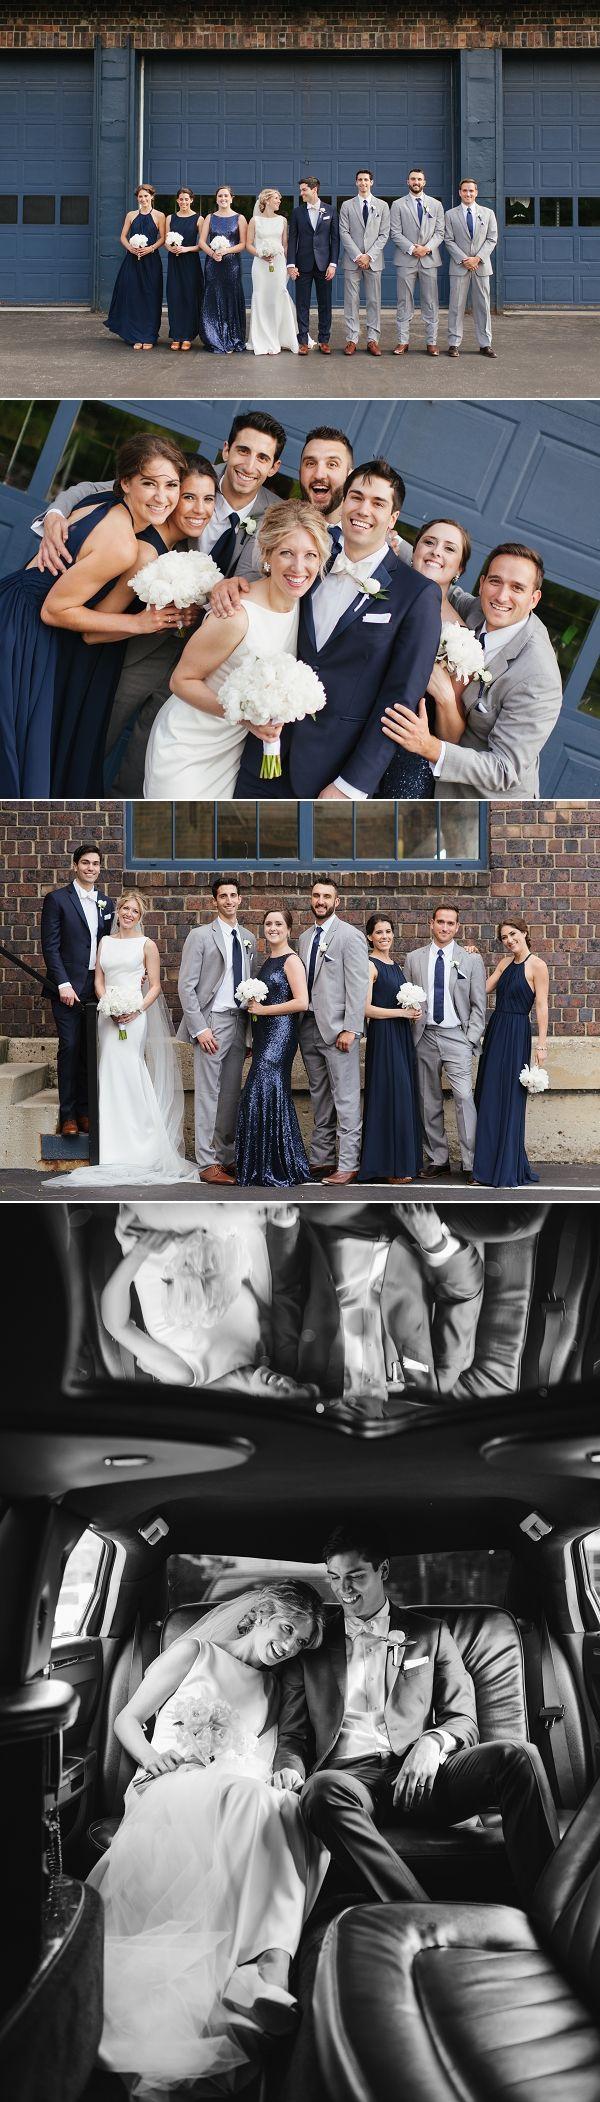 Jessica Miller Photography Dock 580 columbus oh wedding